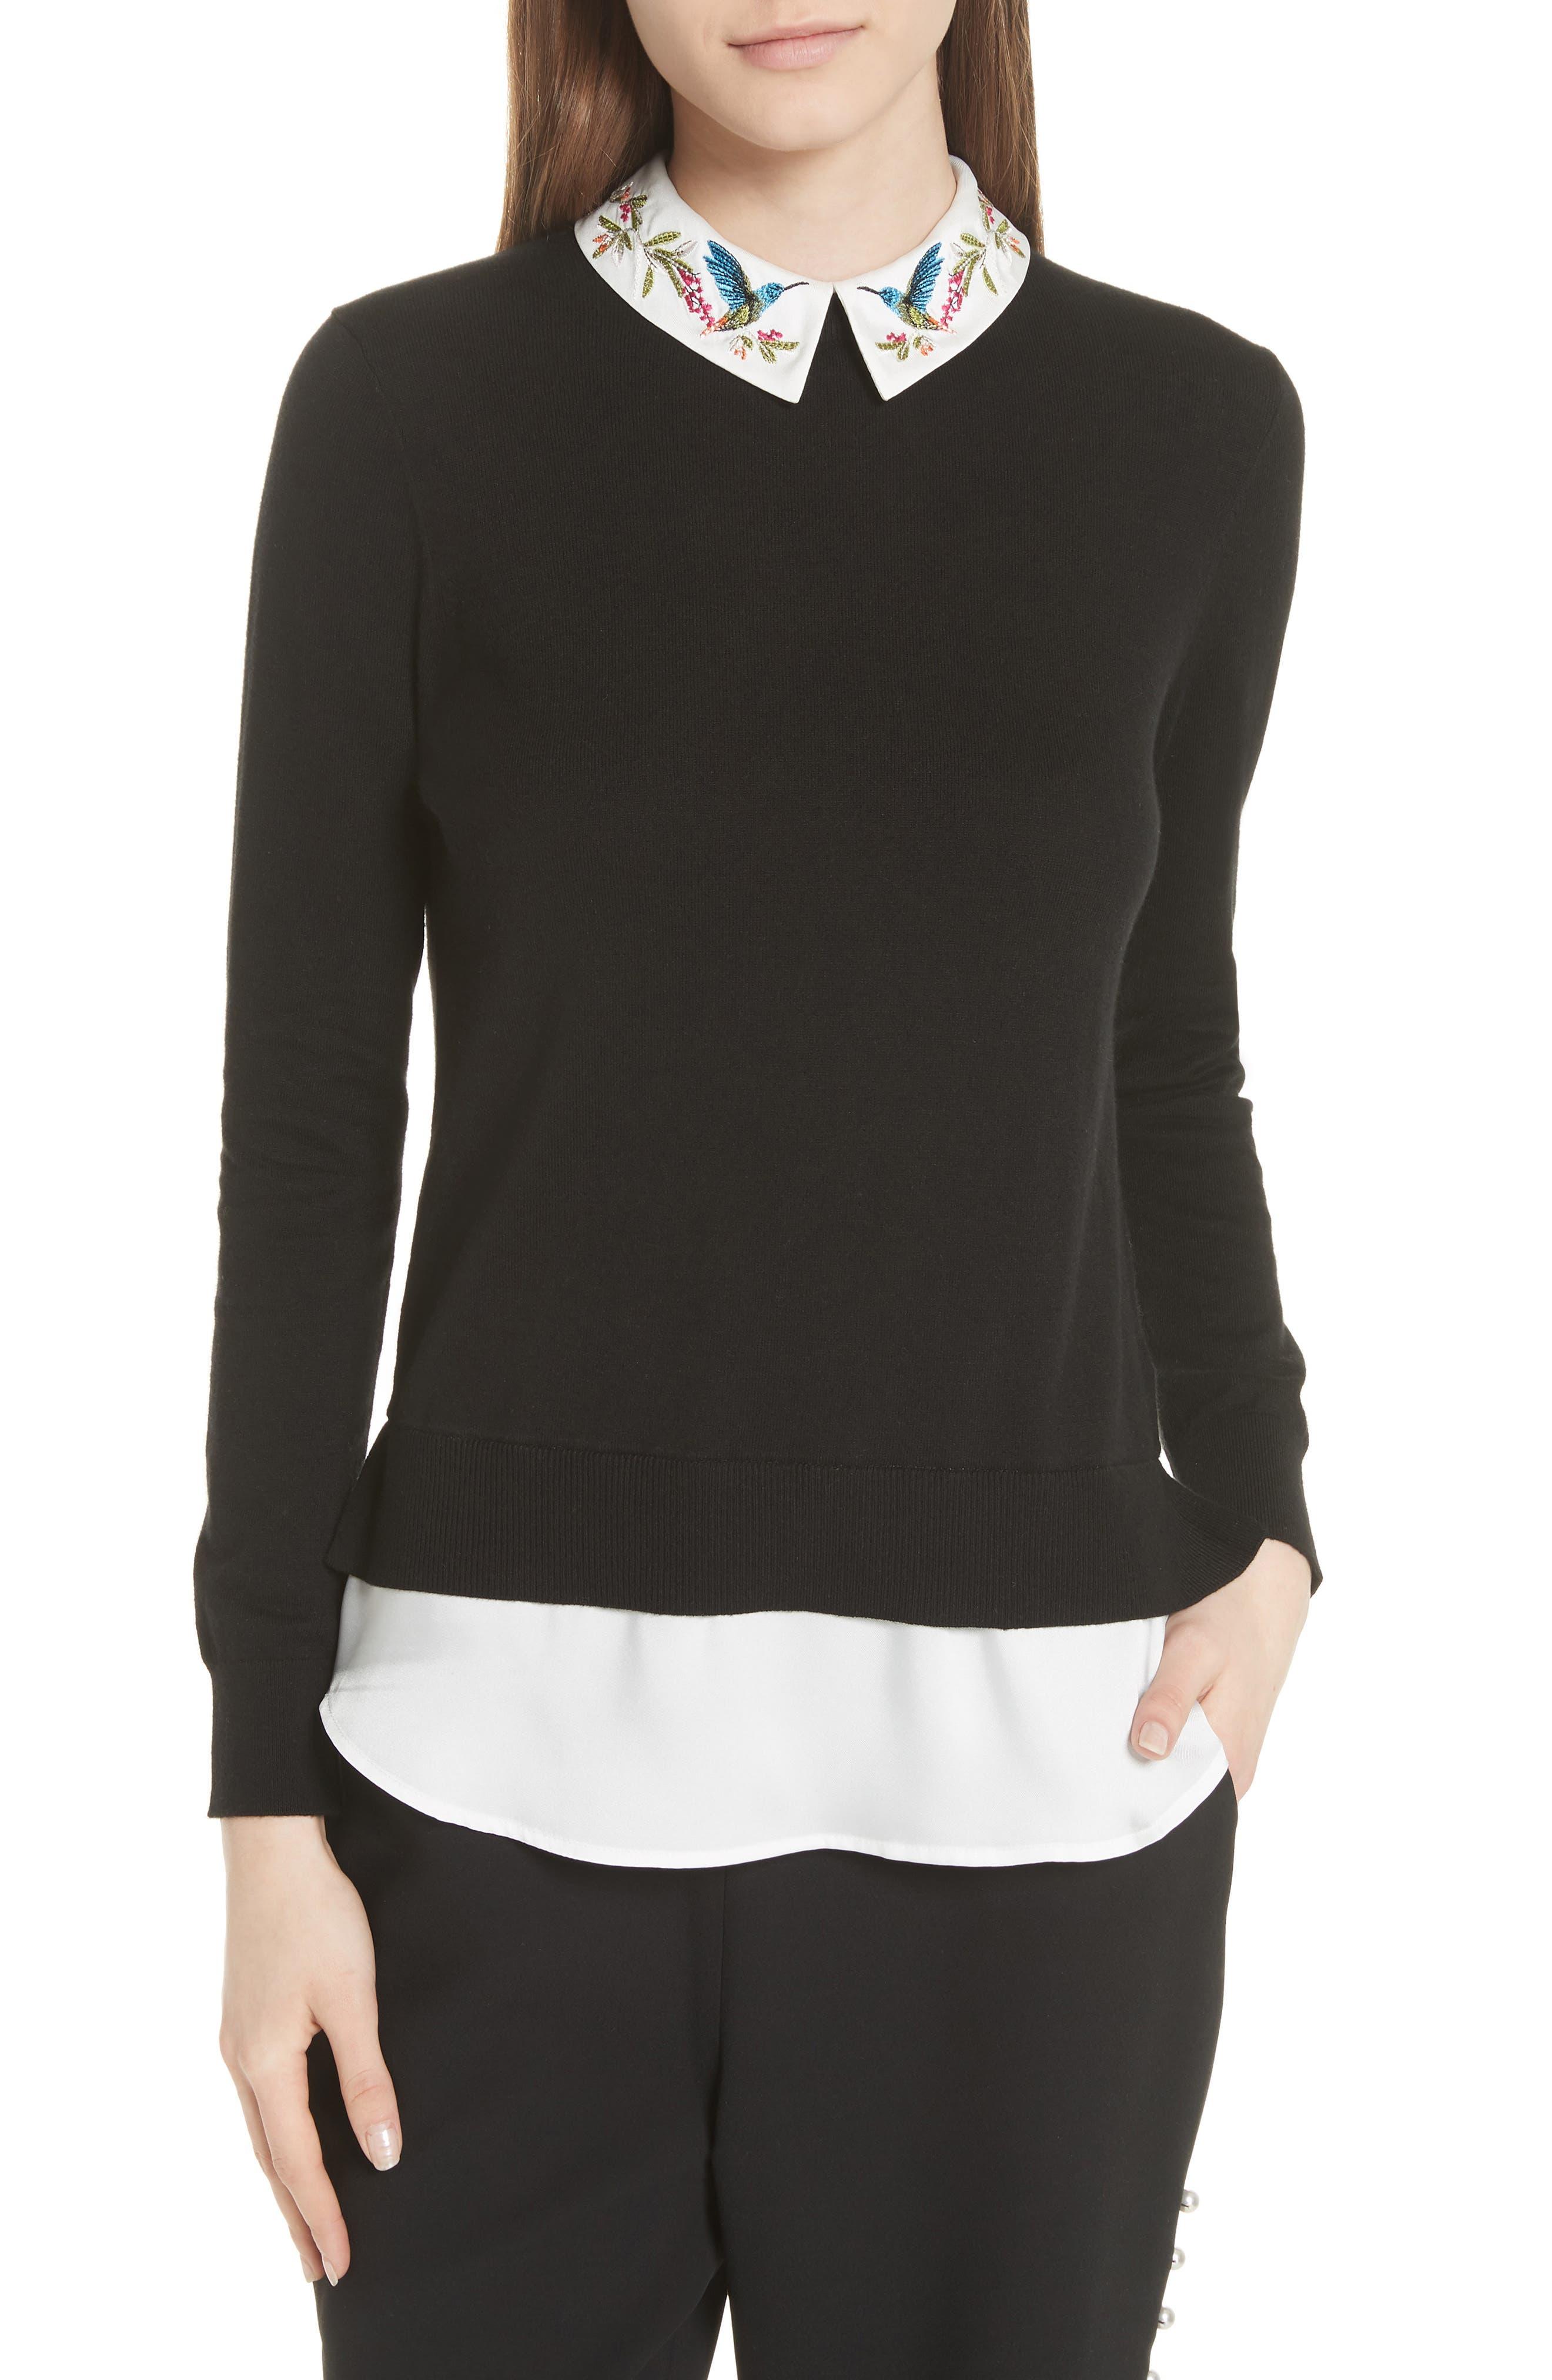 Highgrove Layered Look Sweater,                             Main thumbnail 1, color,                             001